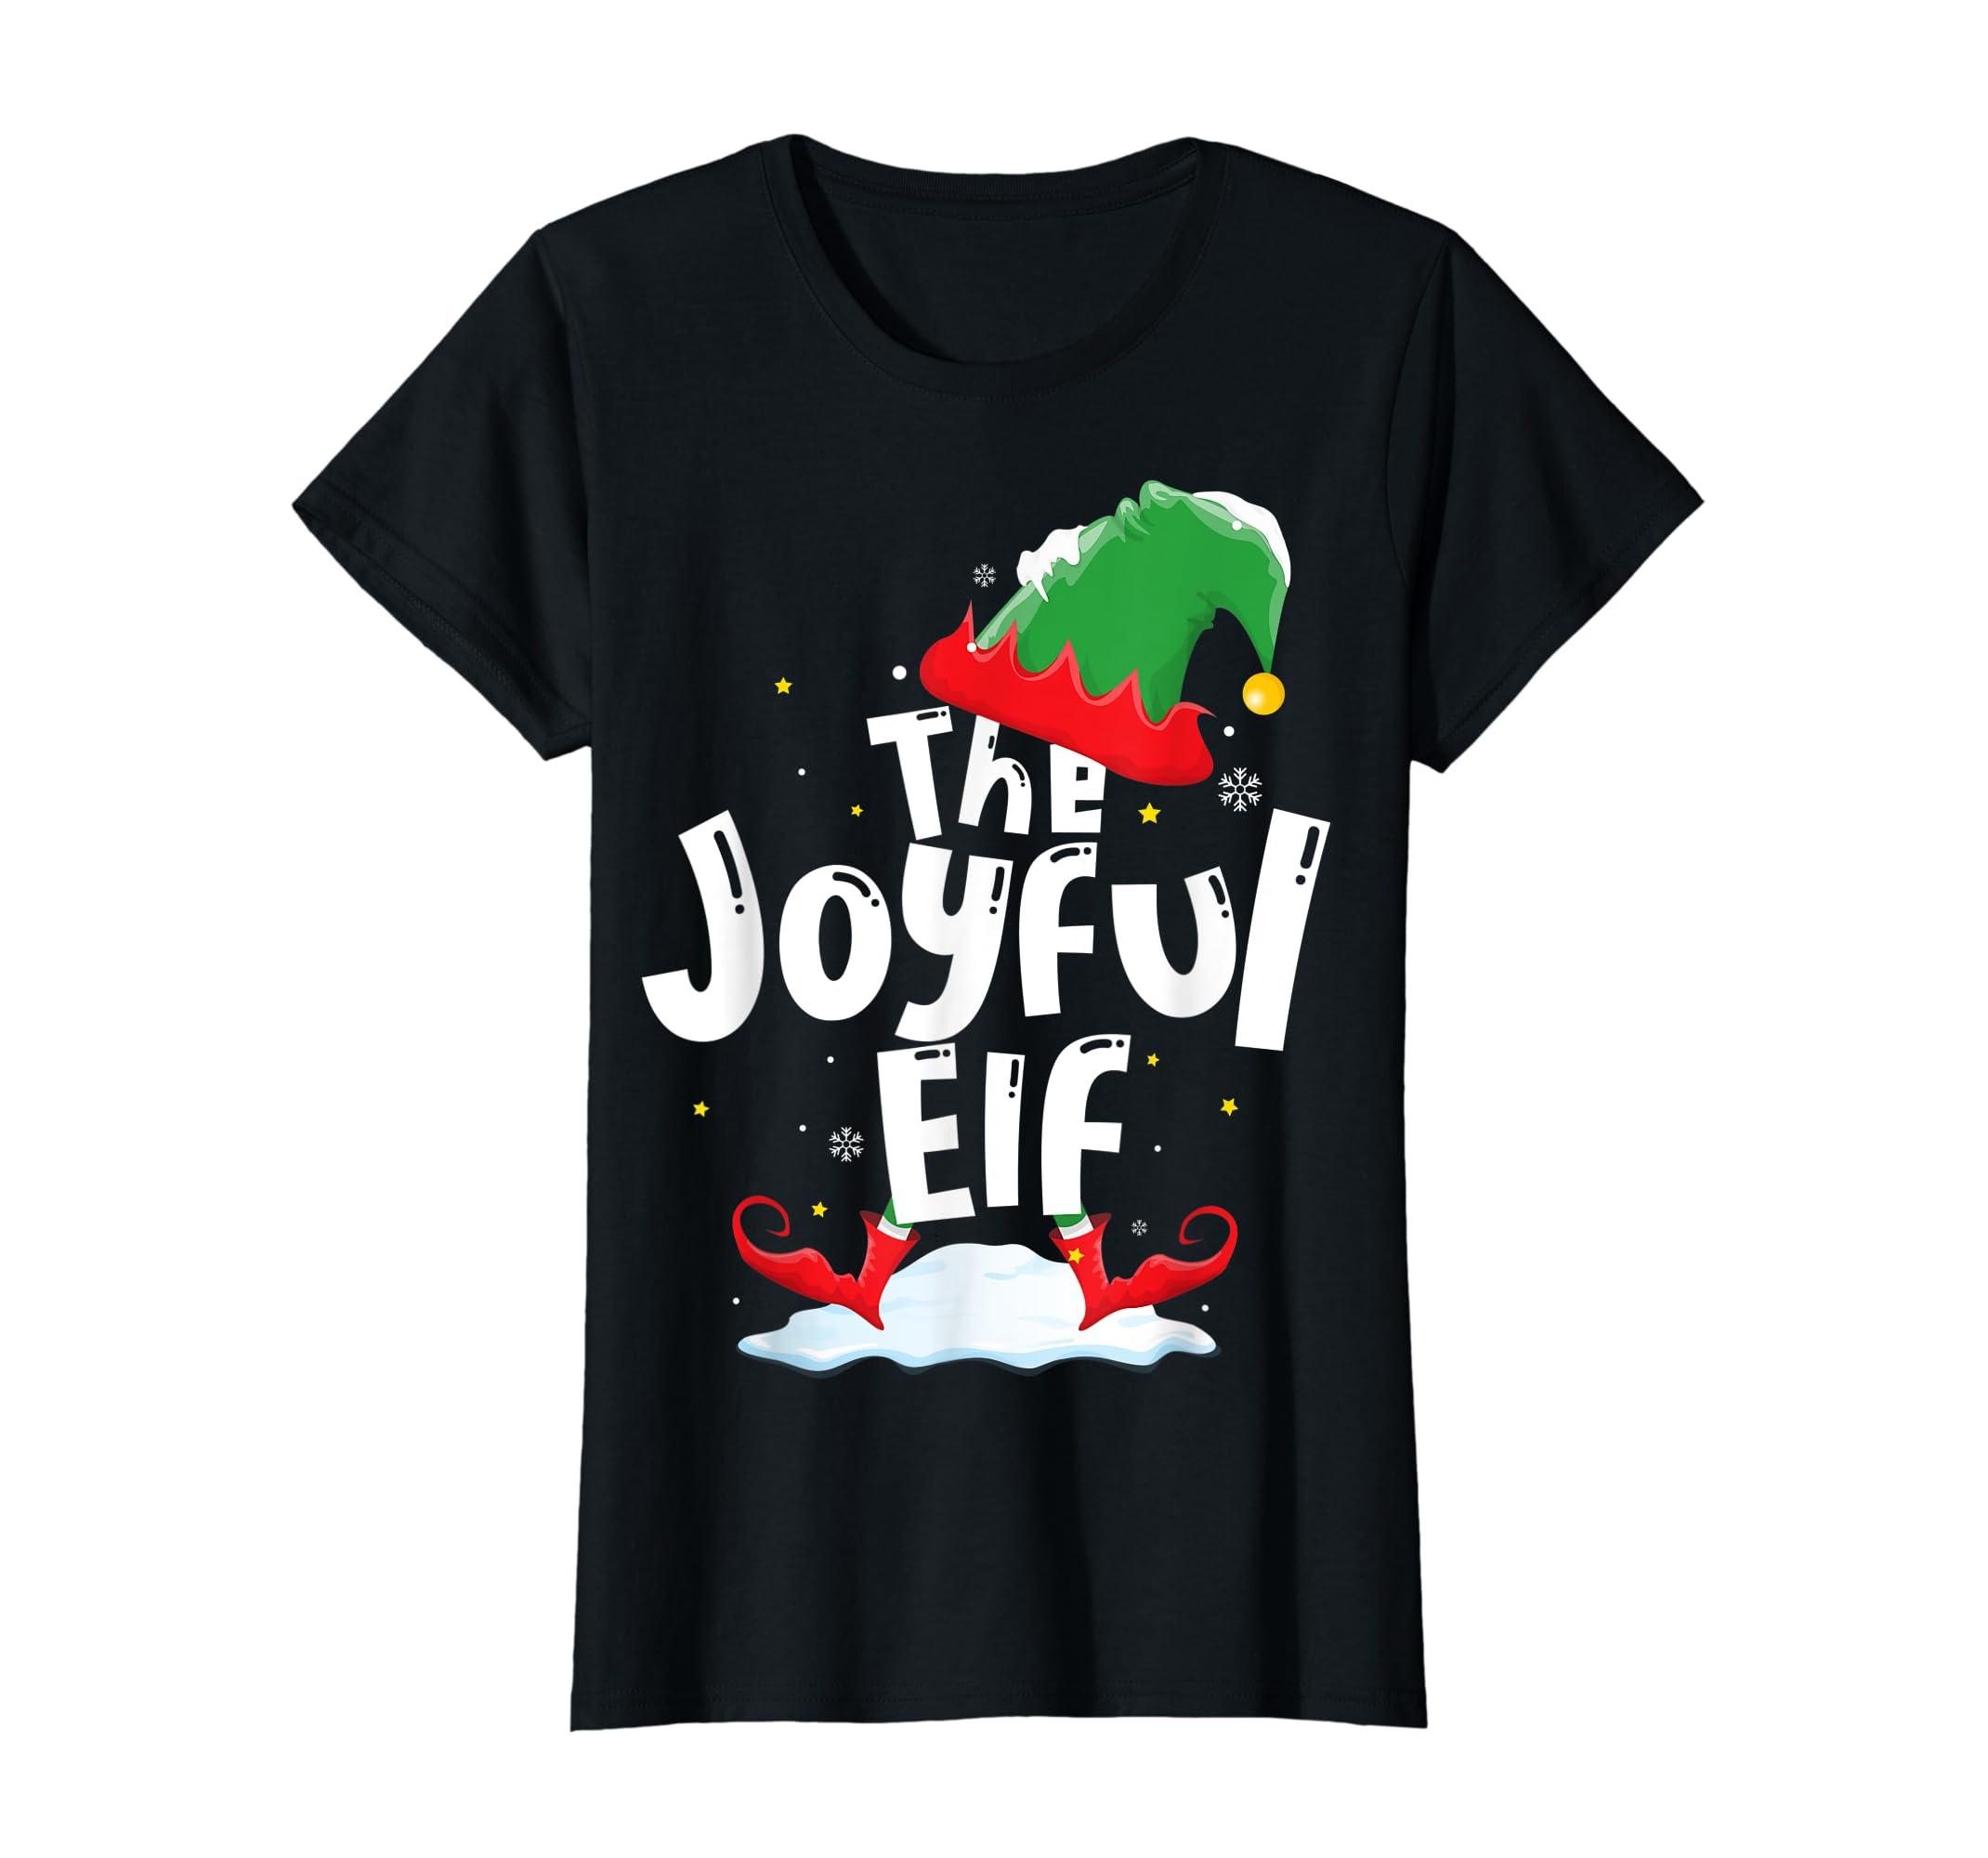 The Joyful Elf Group Matching Family Christmas Gifts Holiday T-Shirt-Women's T-Shirt-Black